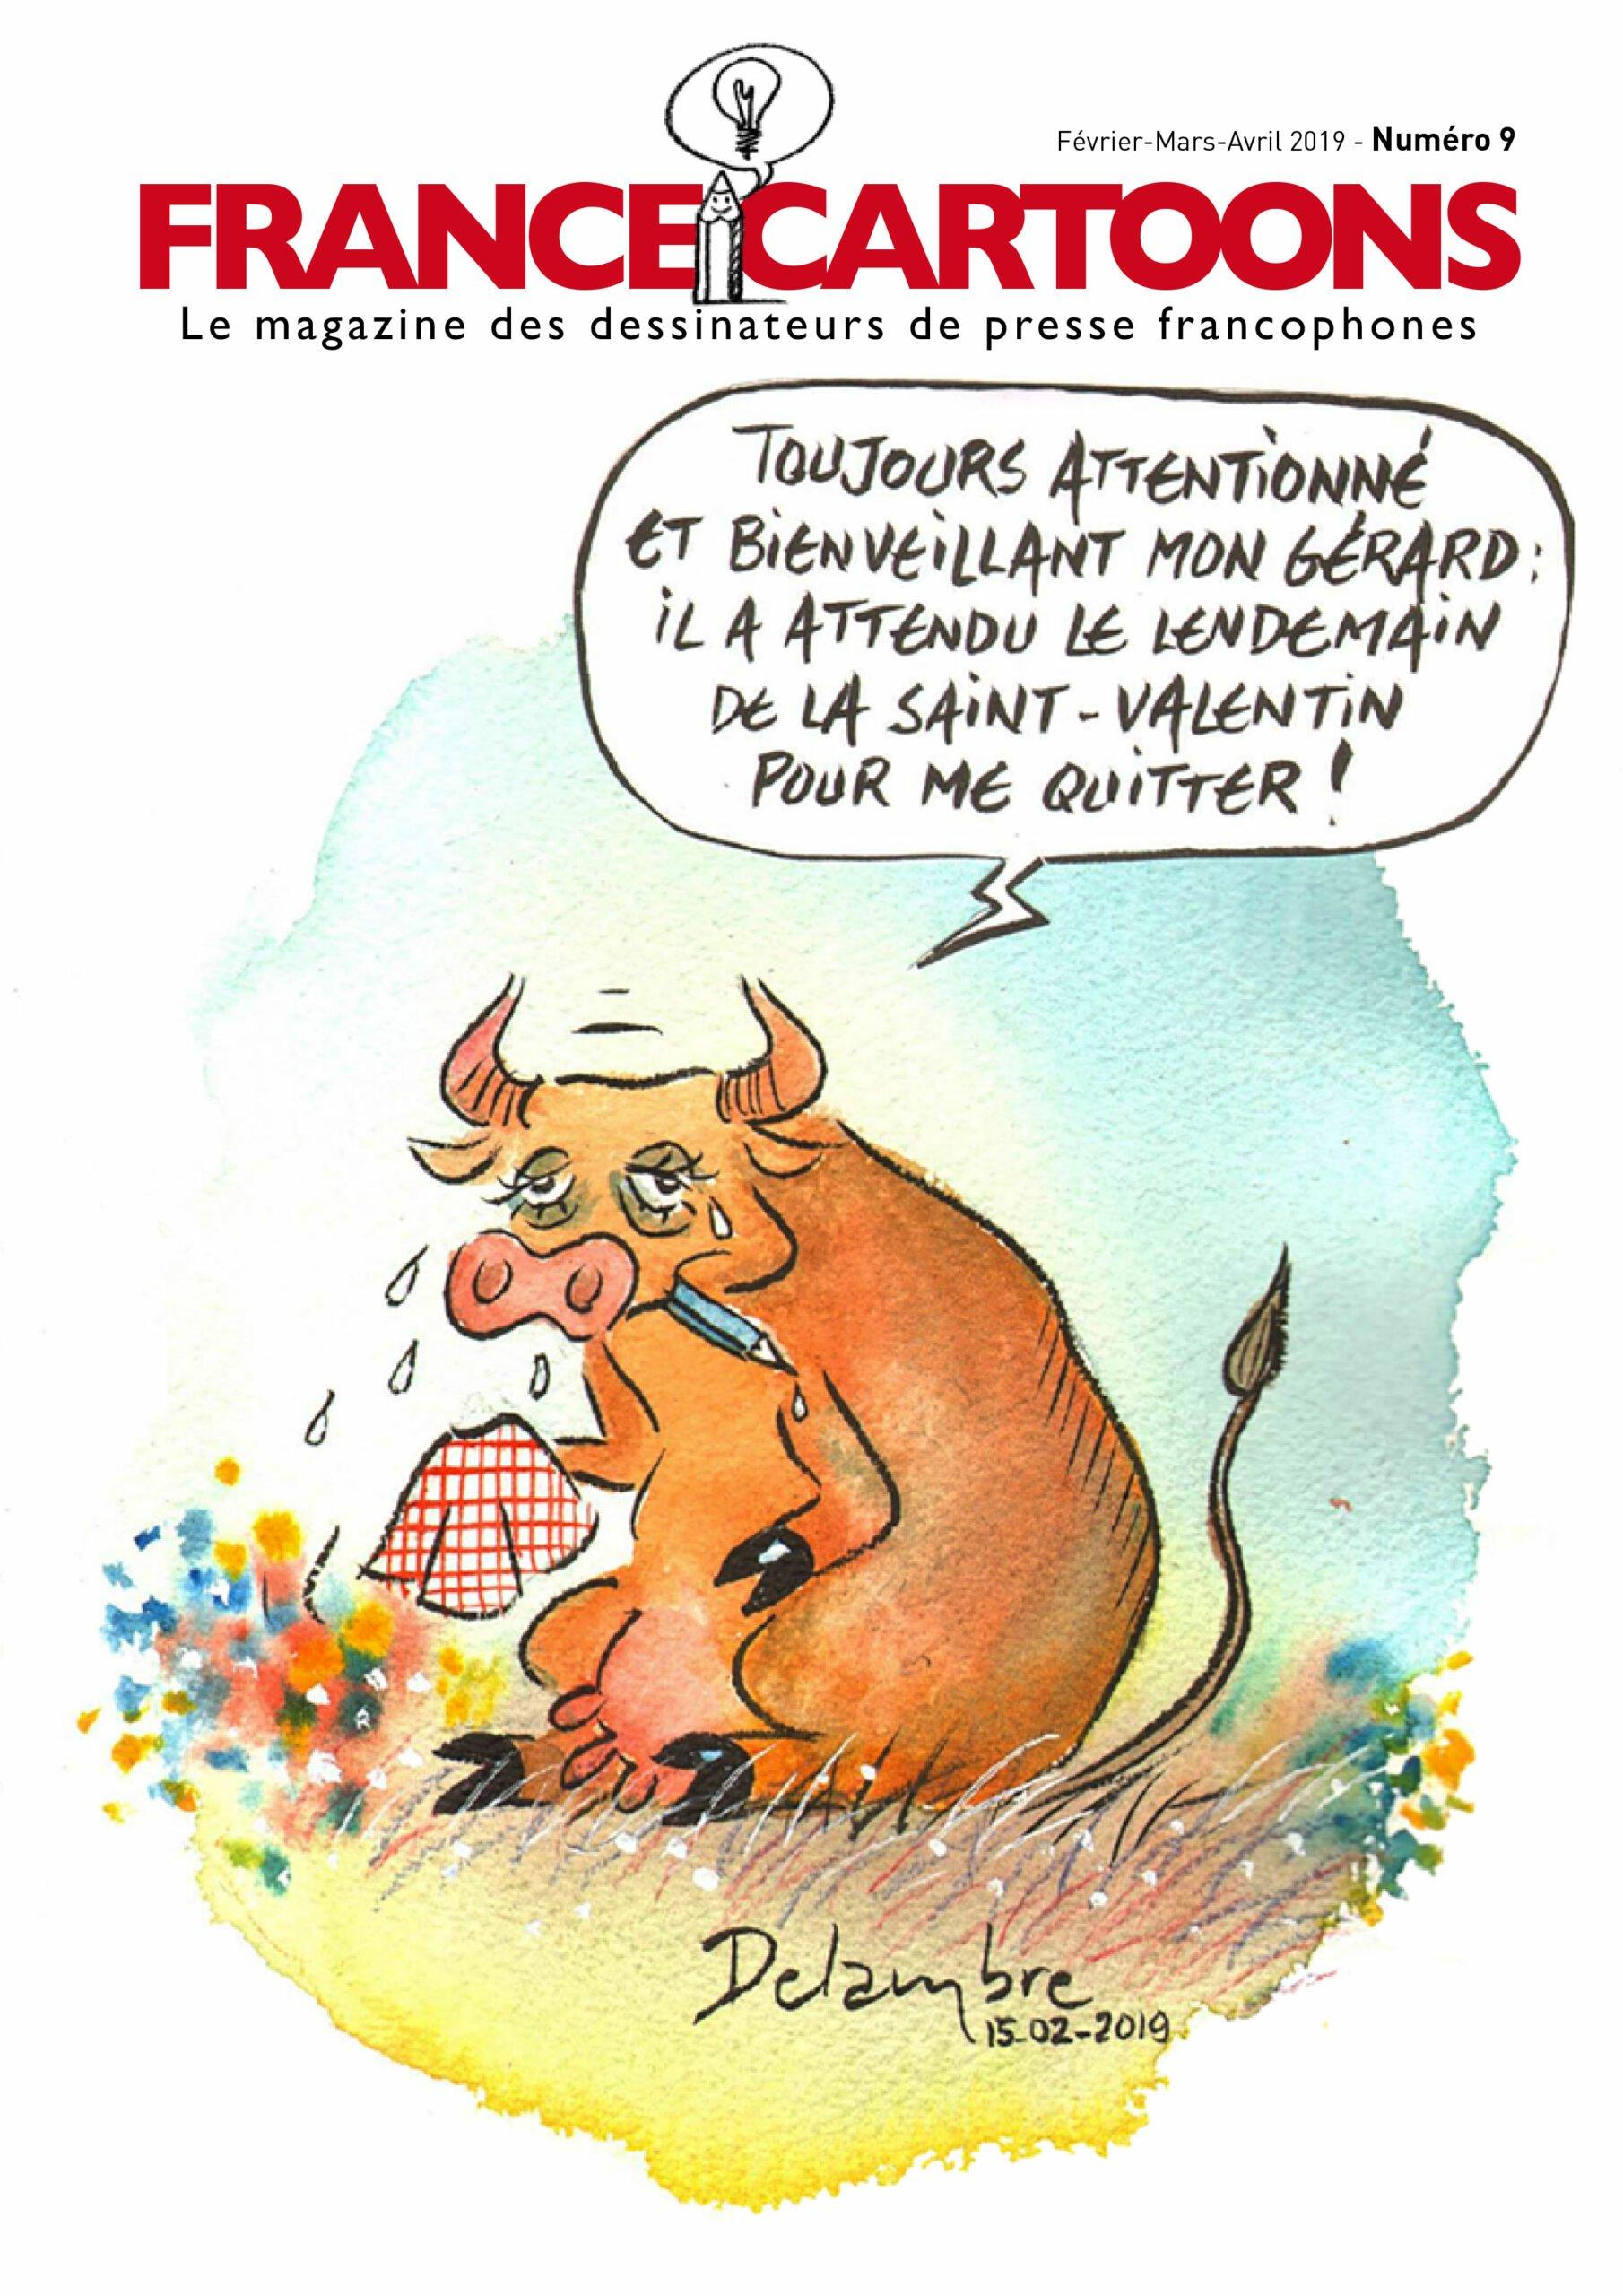 France-Cartoons n°9